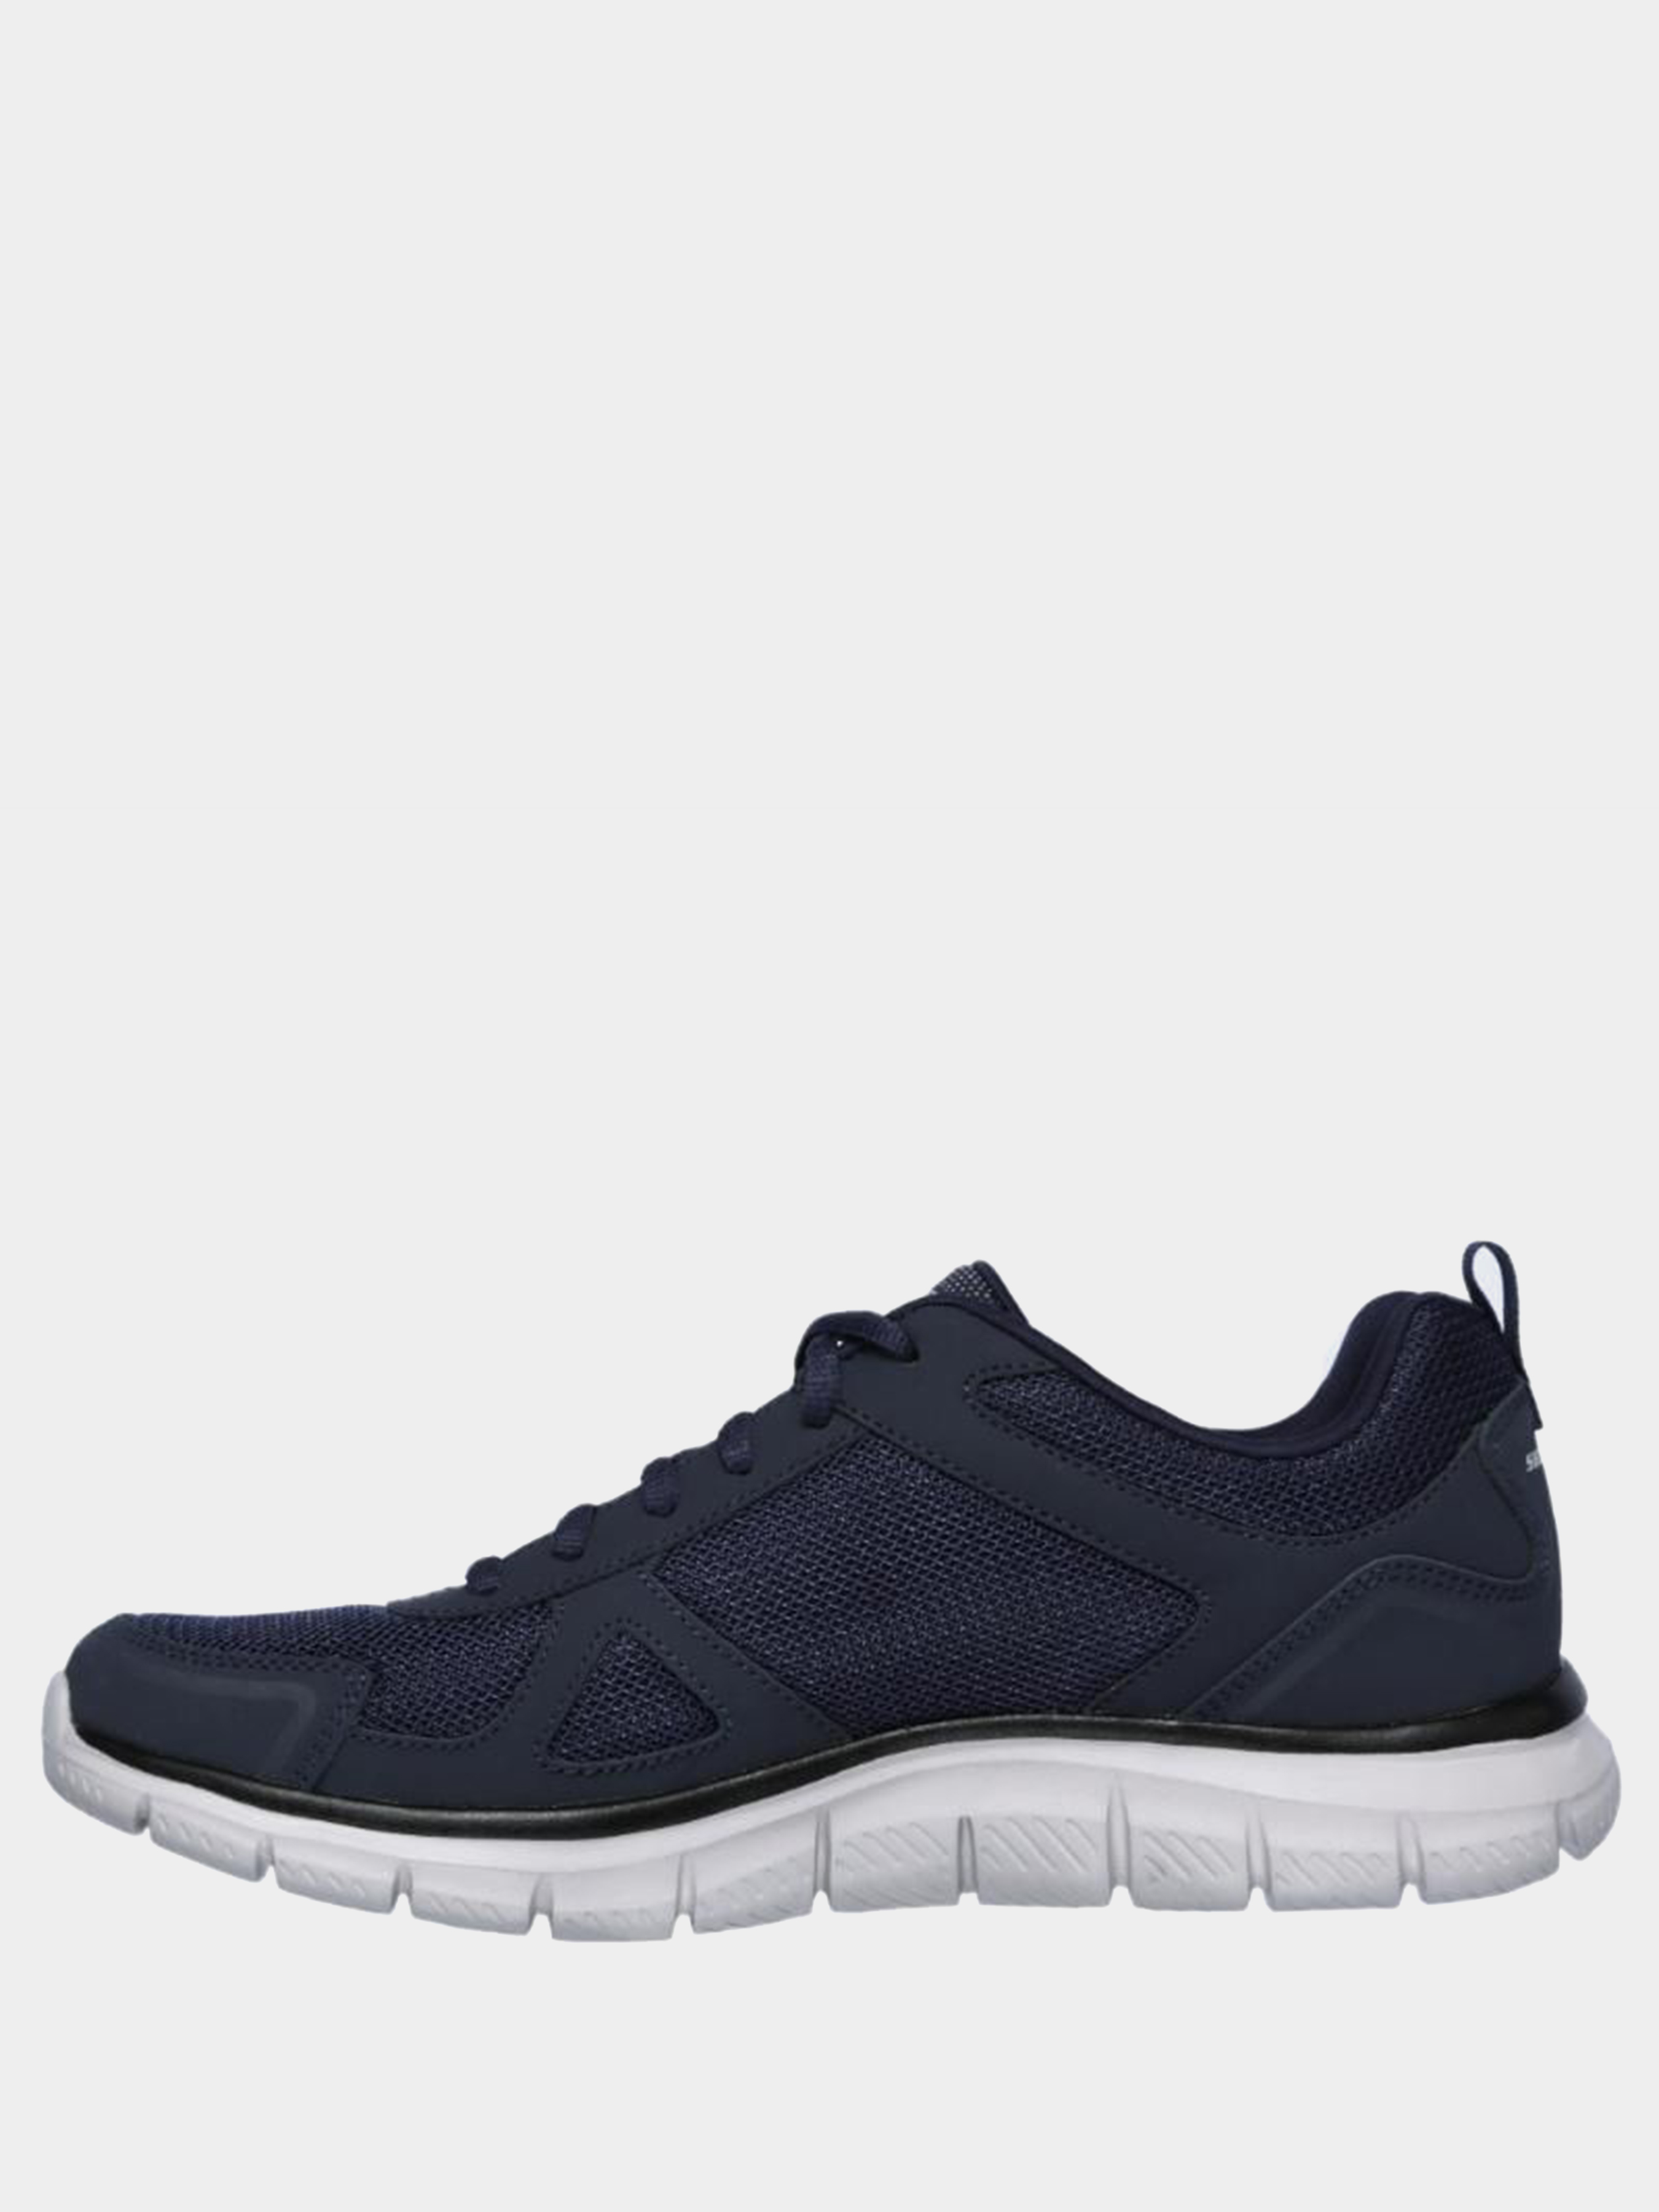 Кросівки для міста Skechers Track - Scloric 52631W NVY